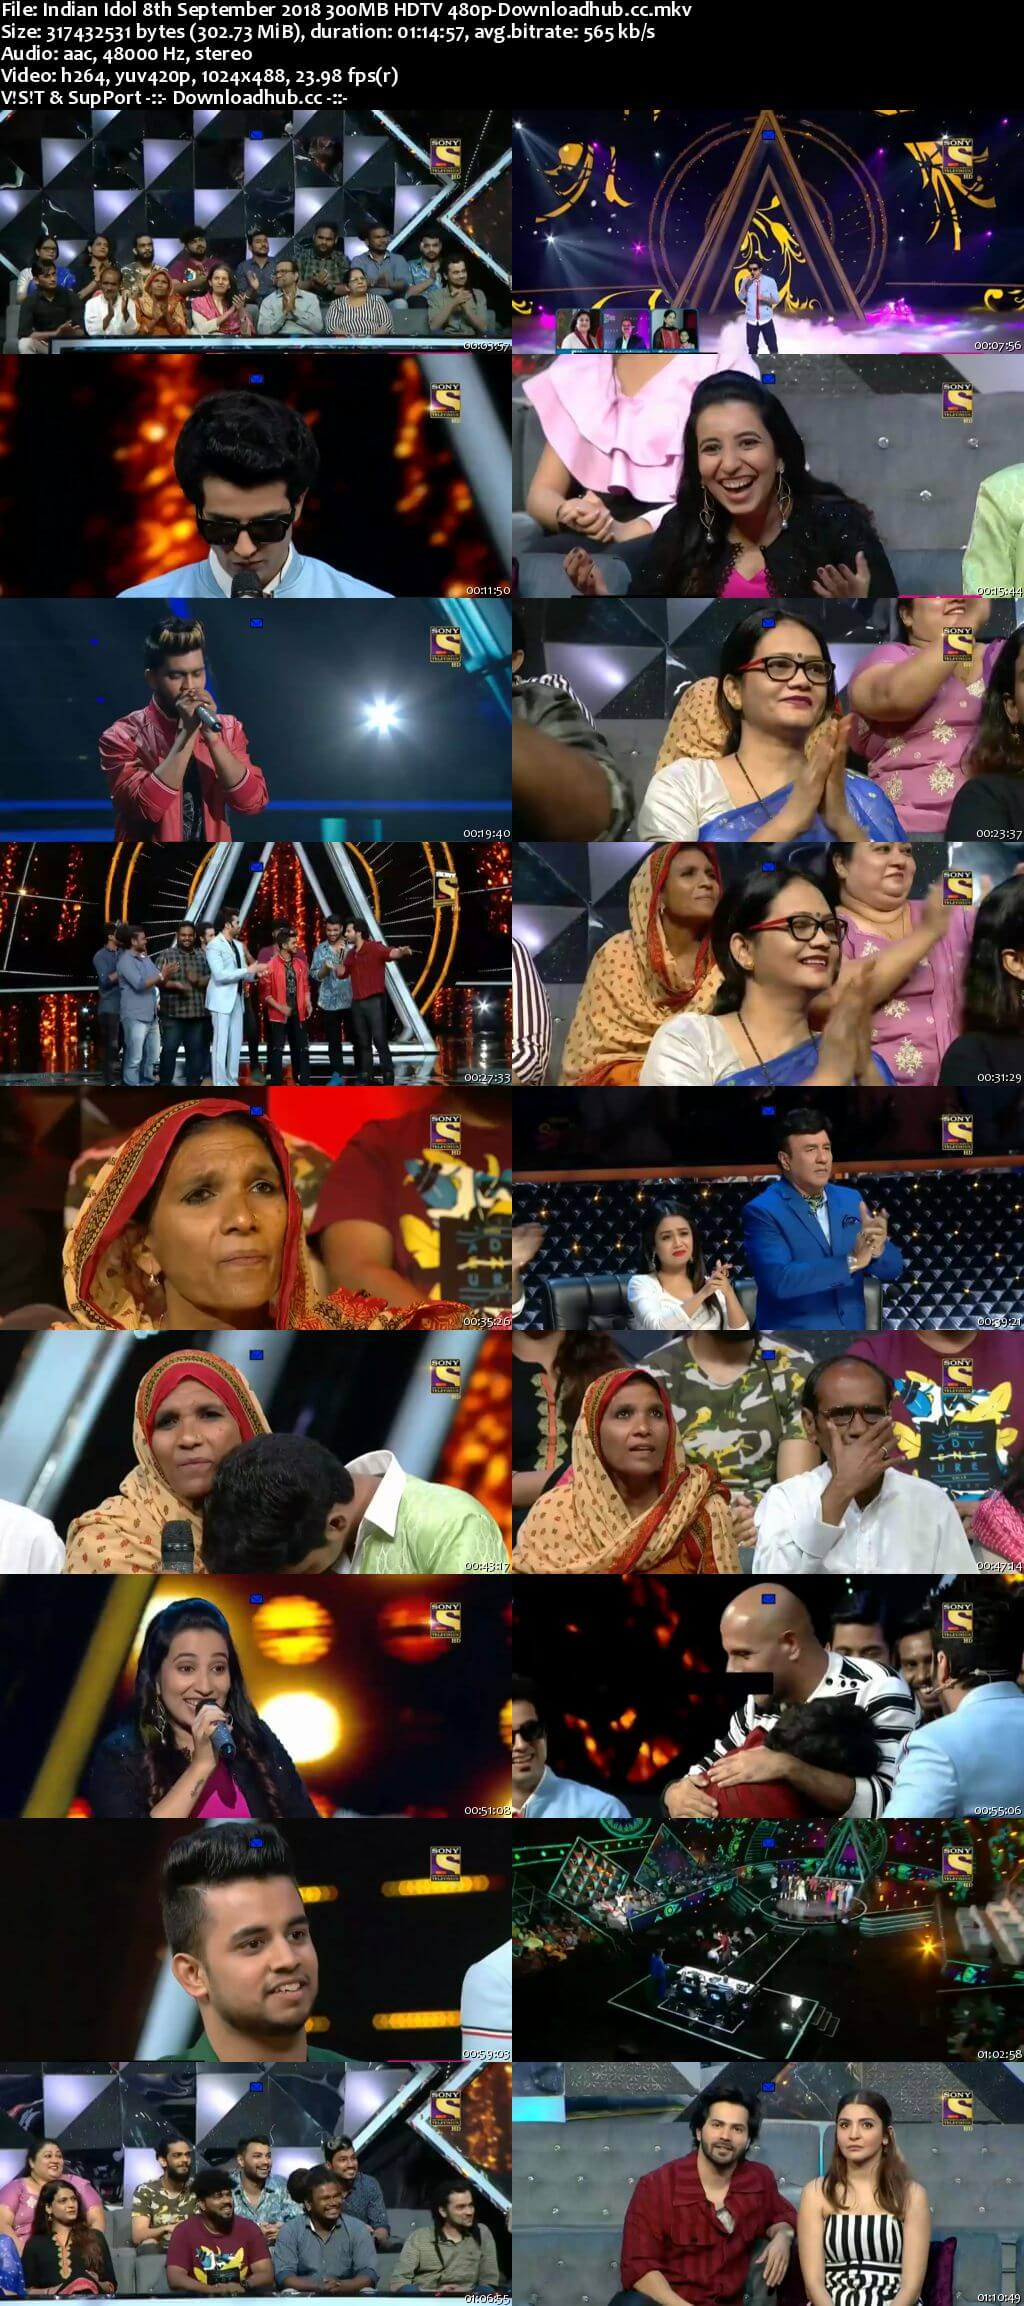 Indian Idol 08 September 2018 Episode 19 HDTV 480p